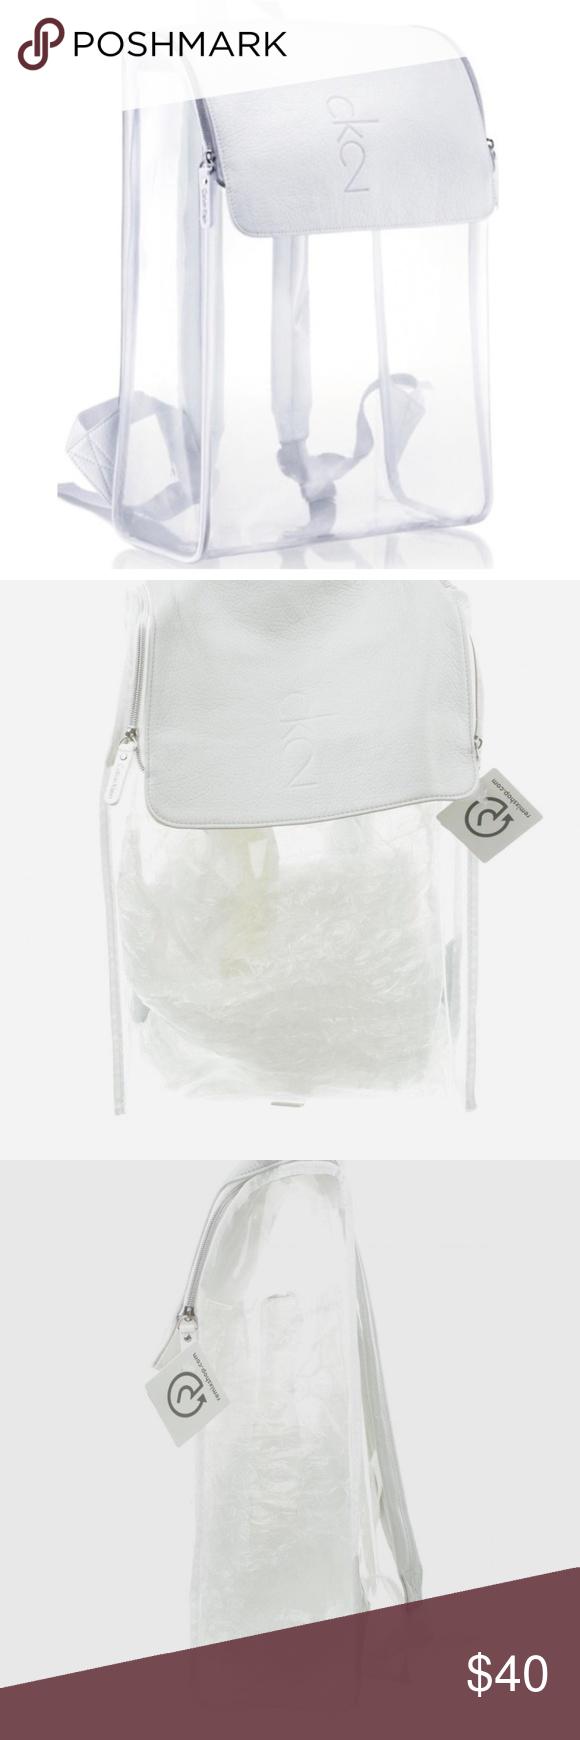 09f4f6c04693d3 NWT Calvin Klein CK2 Clear BackPack Bag Travel NWT Calvin Klein CK2 Clear  BackPack Hand Shoulder